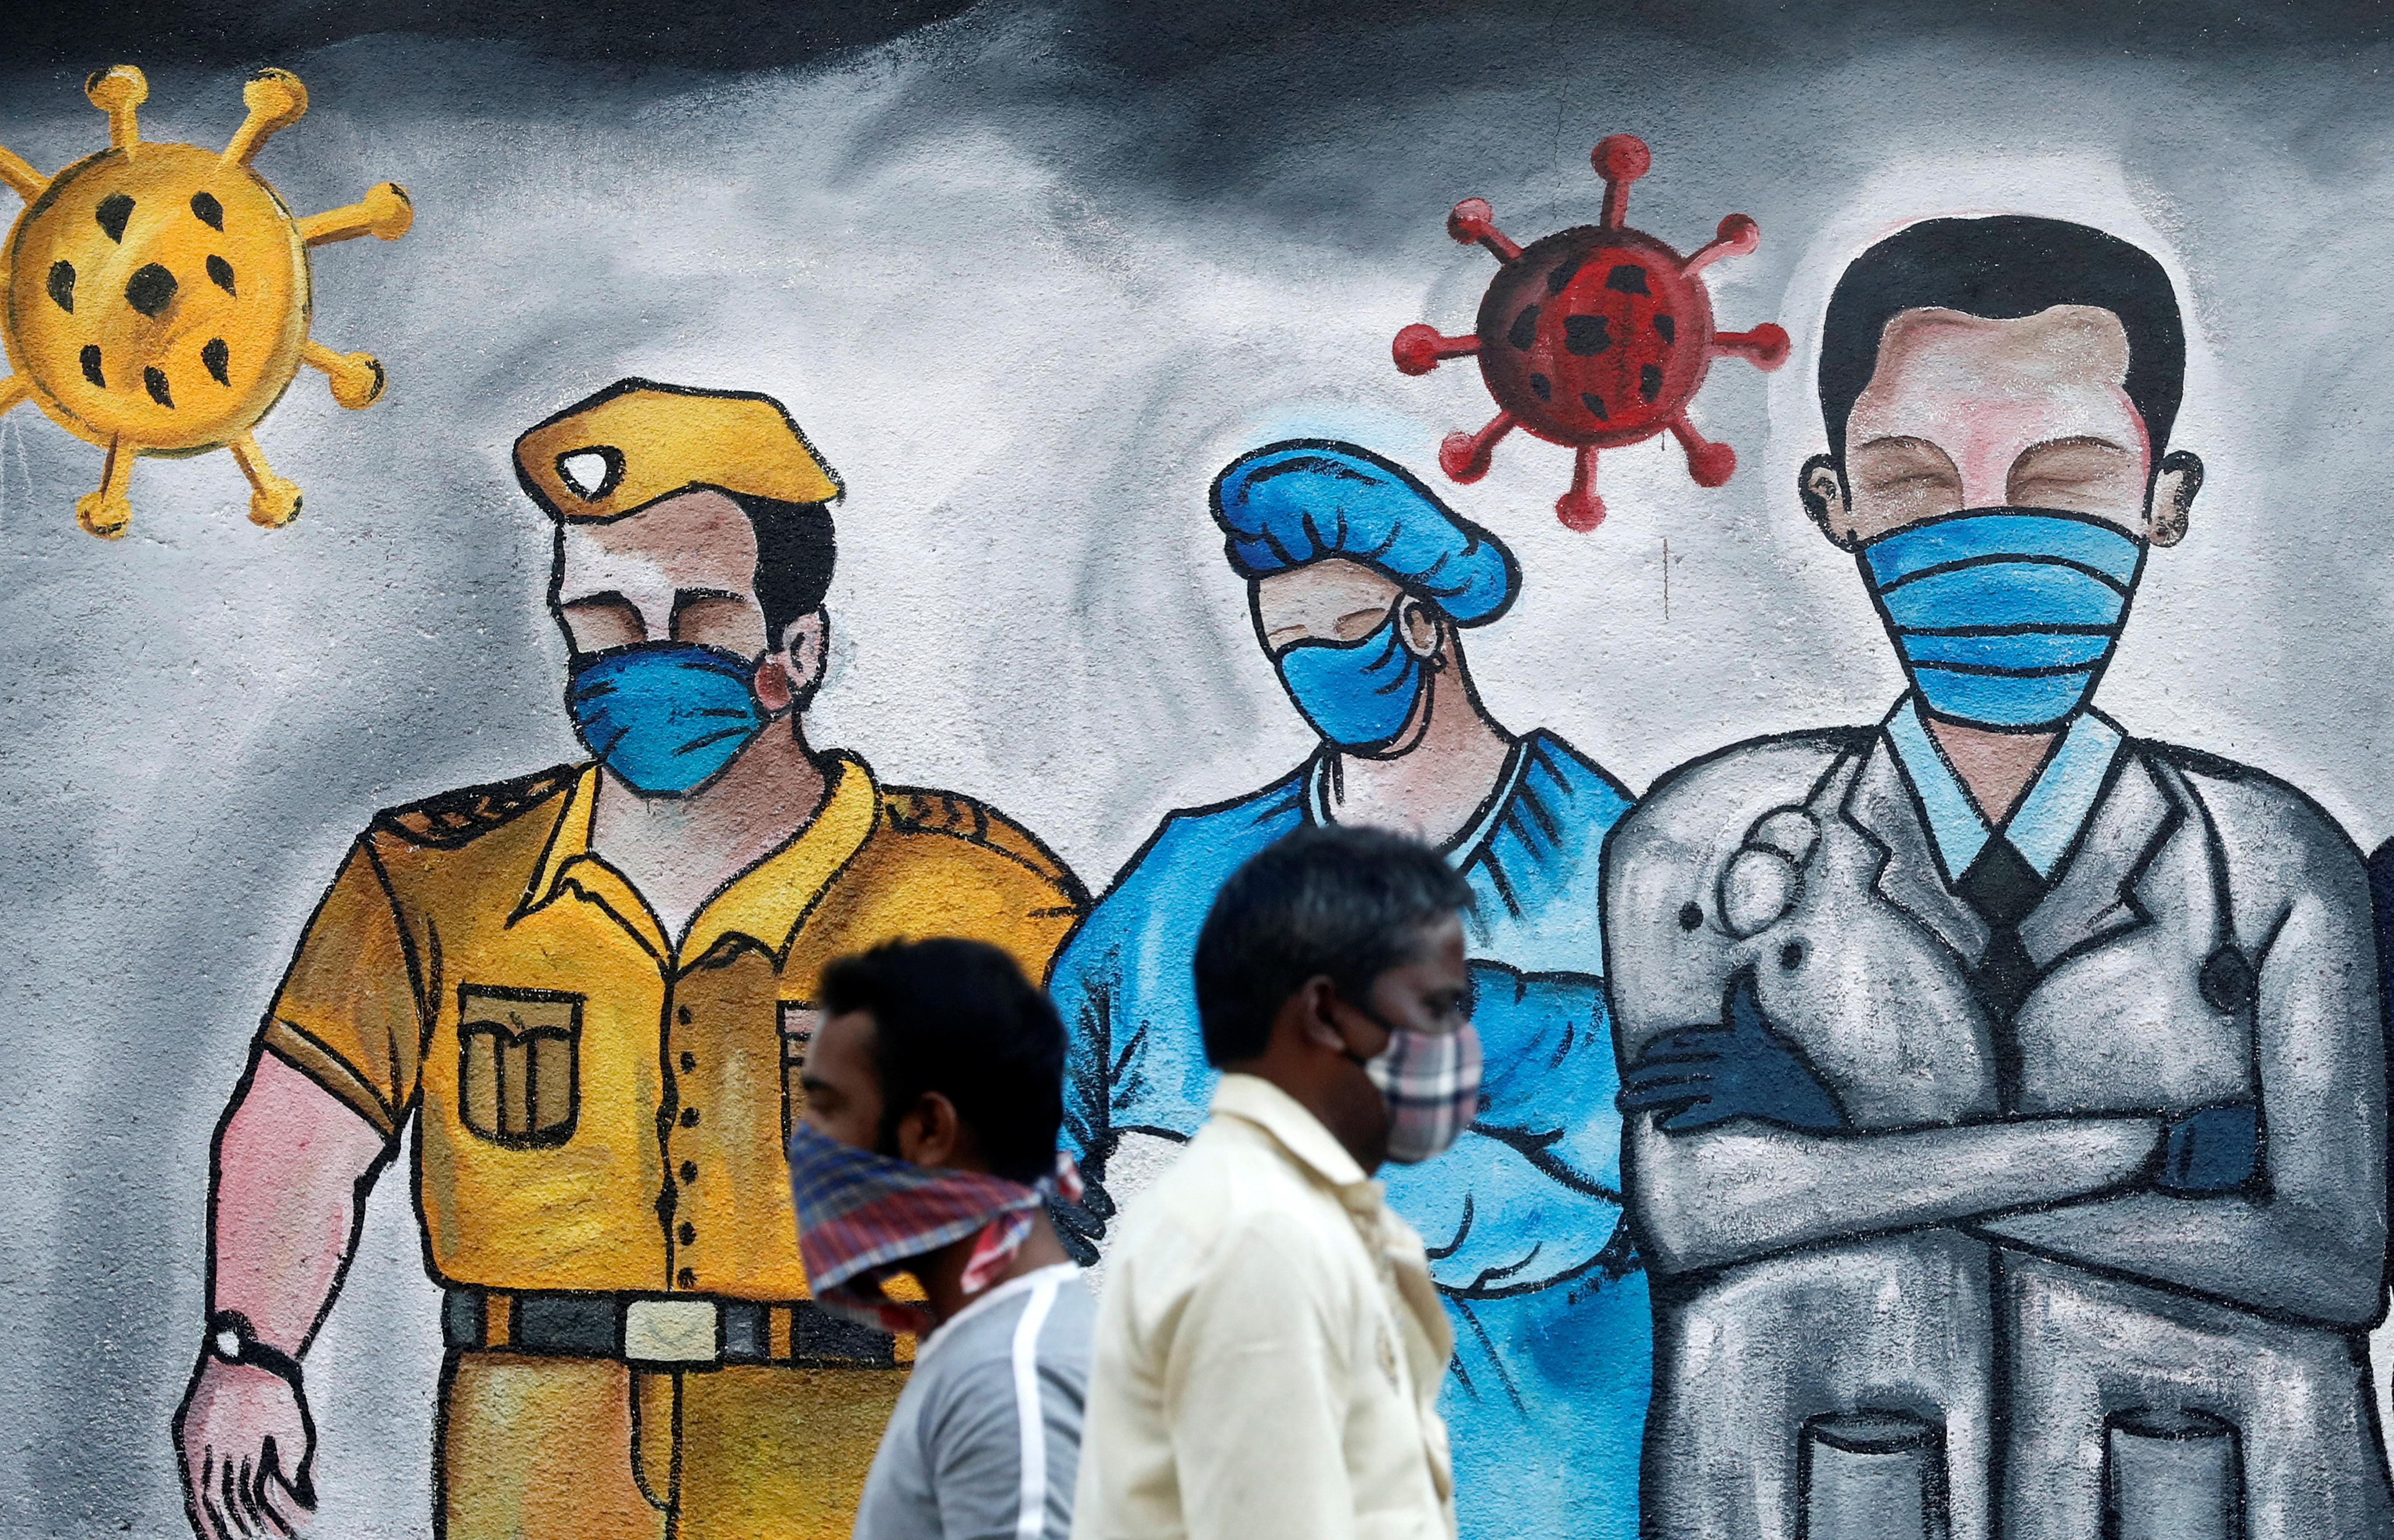 Men walk past a mural of frontline workers amid the spread of the coronavirus disease (COVID-19), in Mumbai, India, December 21, 2020. REUTERS/Francis Mascarenhas/Files